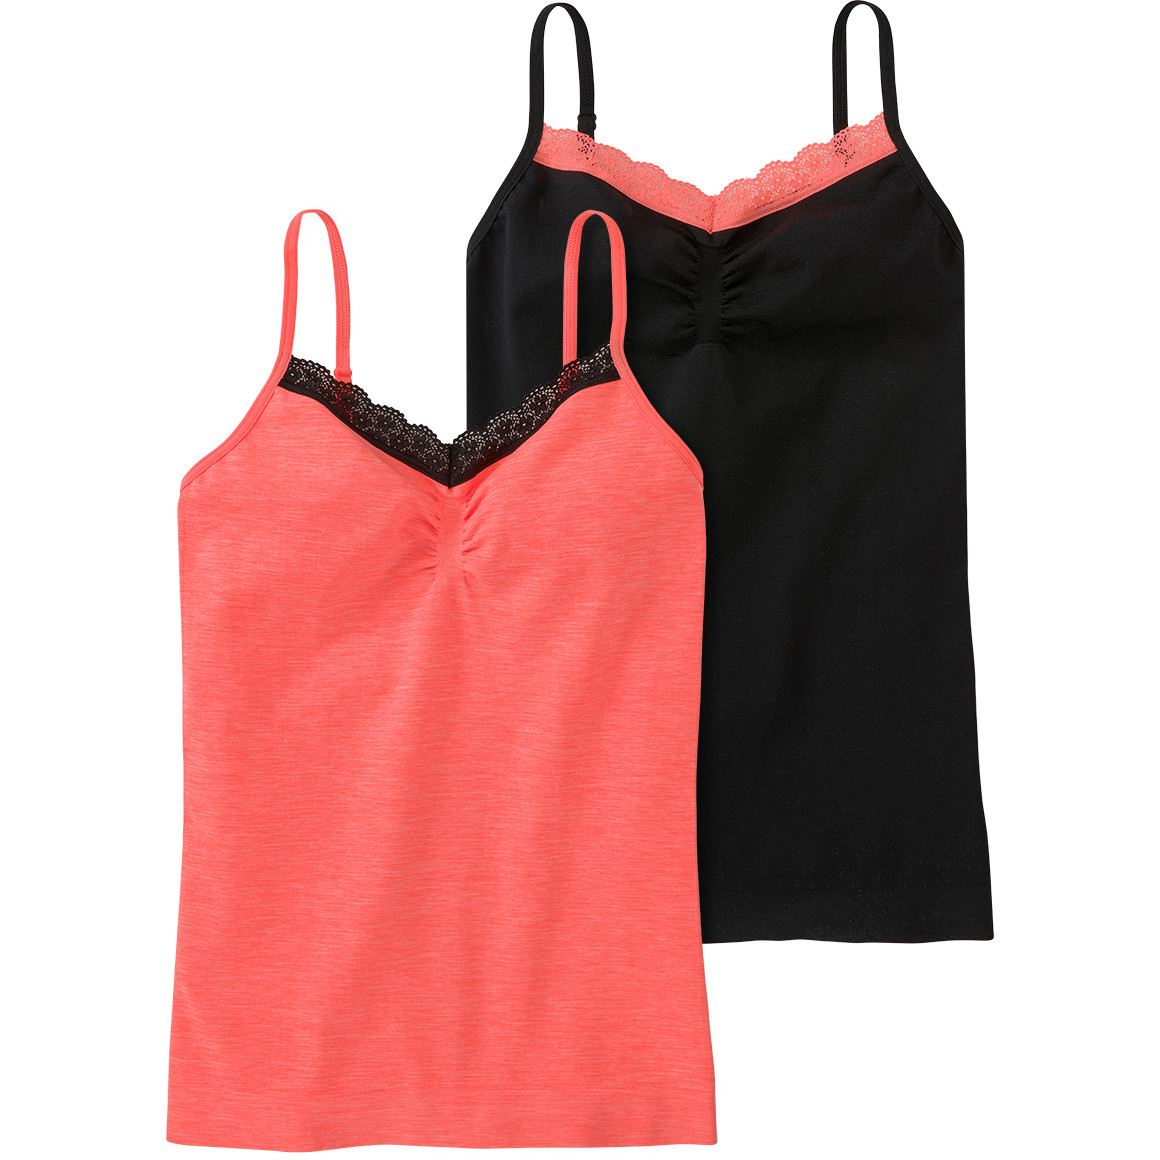 2 Mädchen Seamless Unterhemden